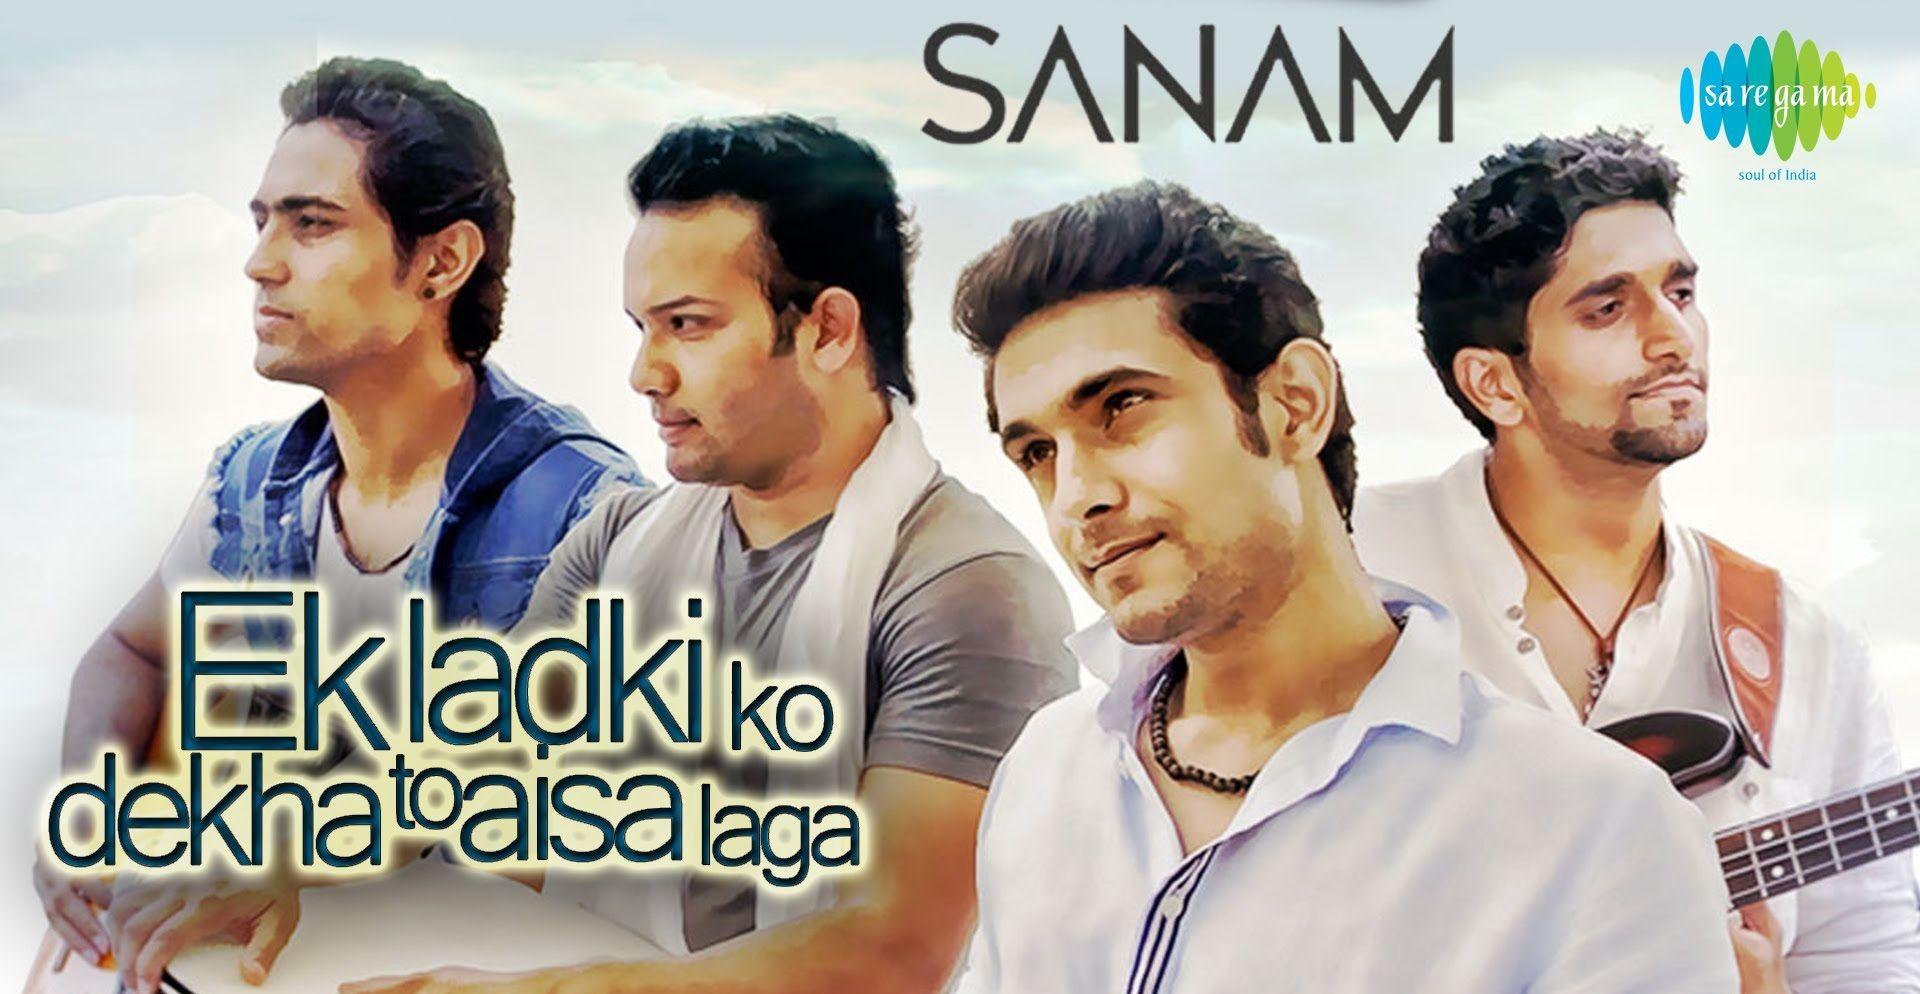 Ekladkikodekhatohaisalaga indian movie songs songs